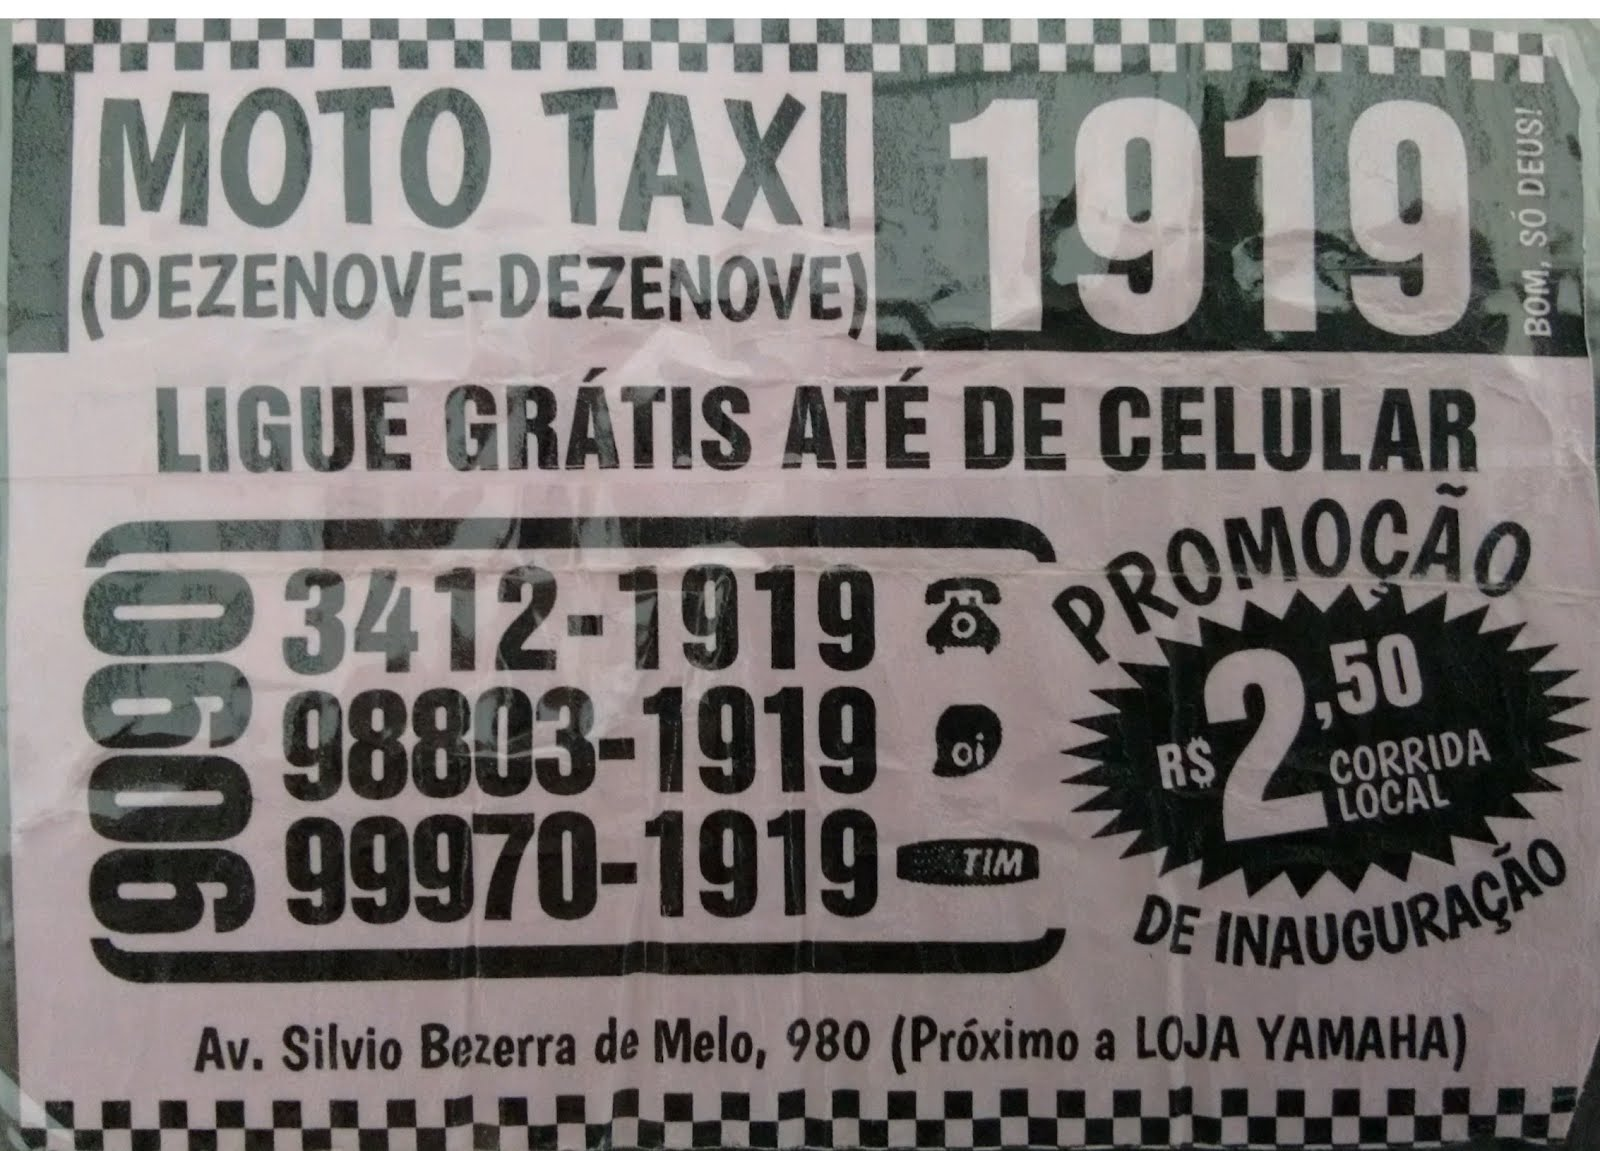 Moto Táxi 1919